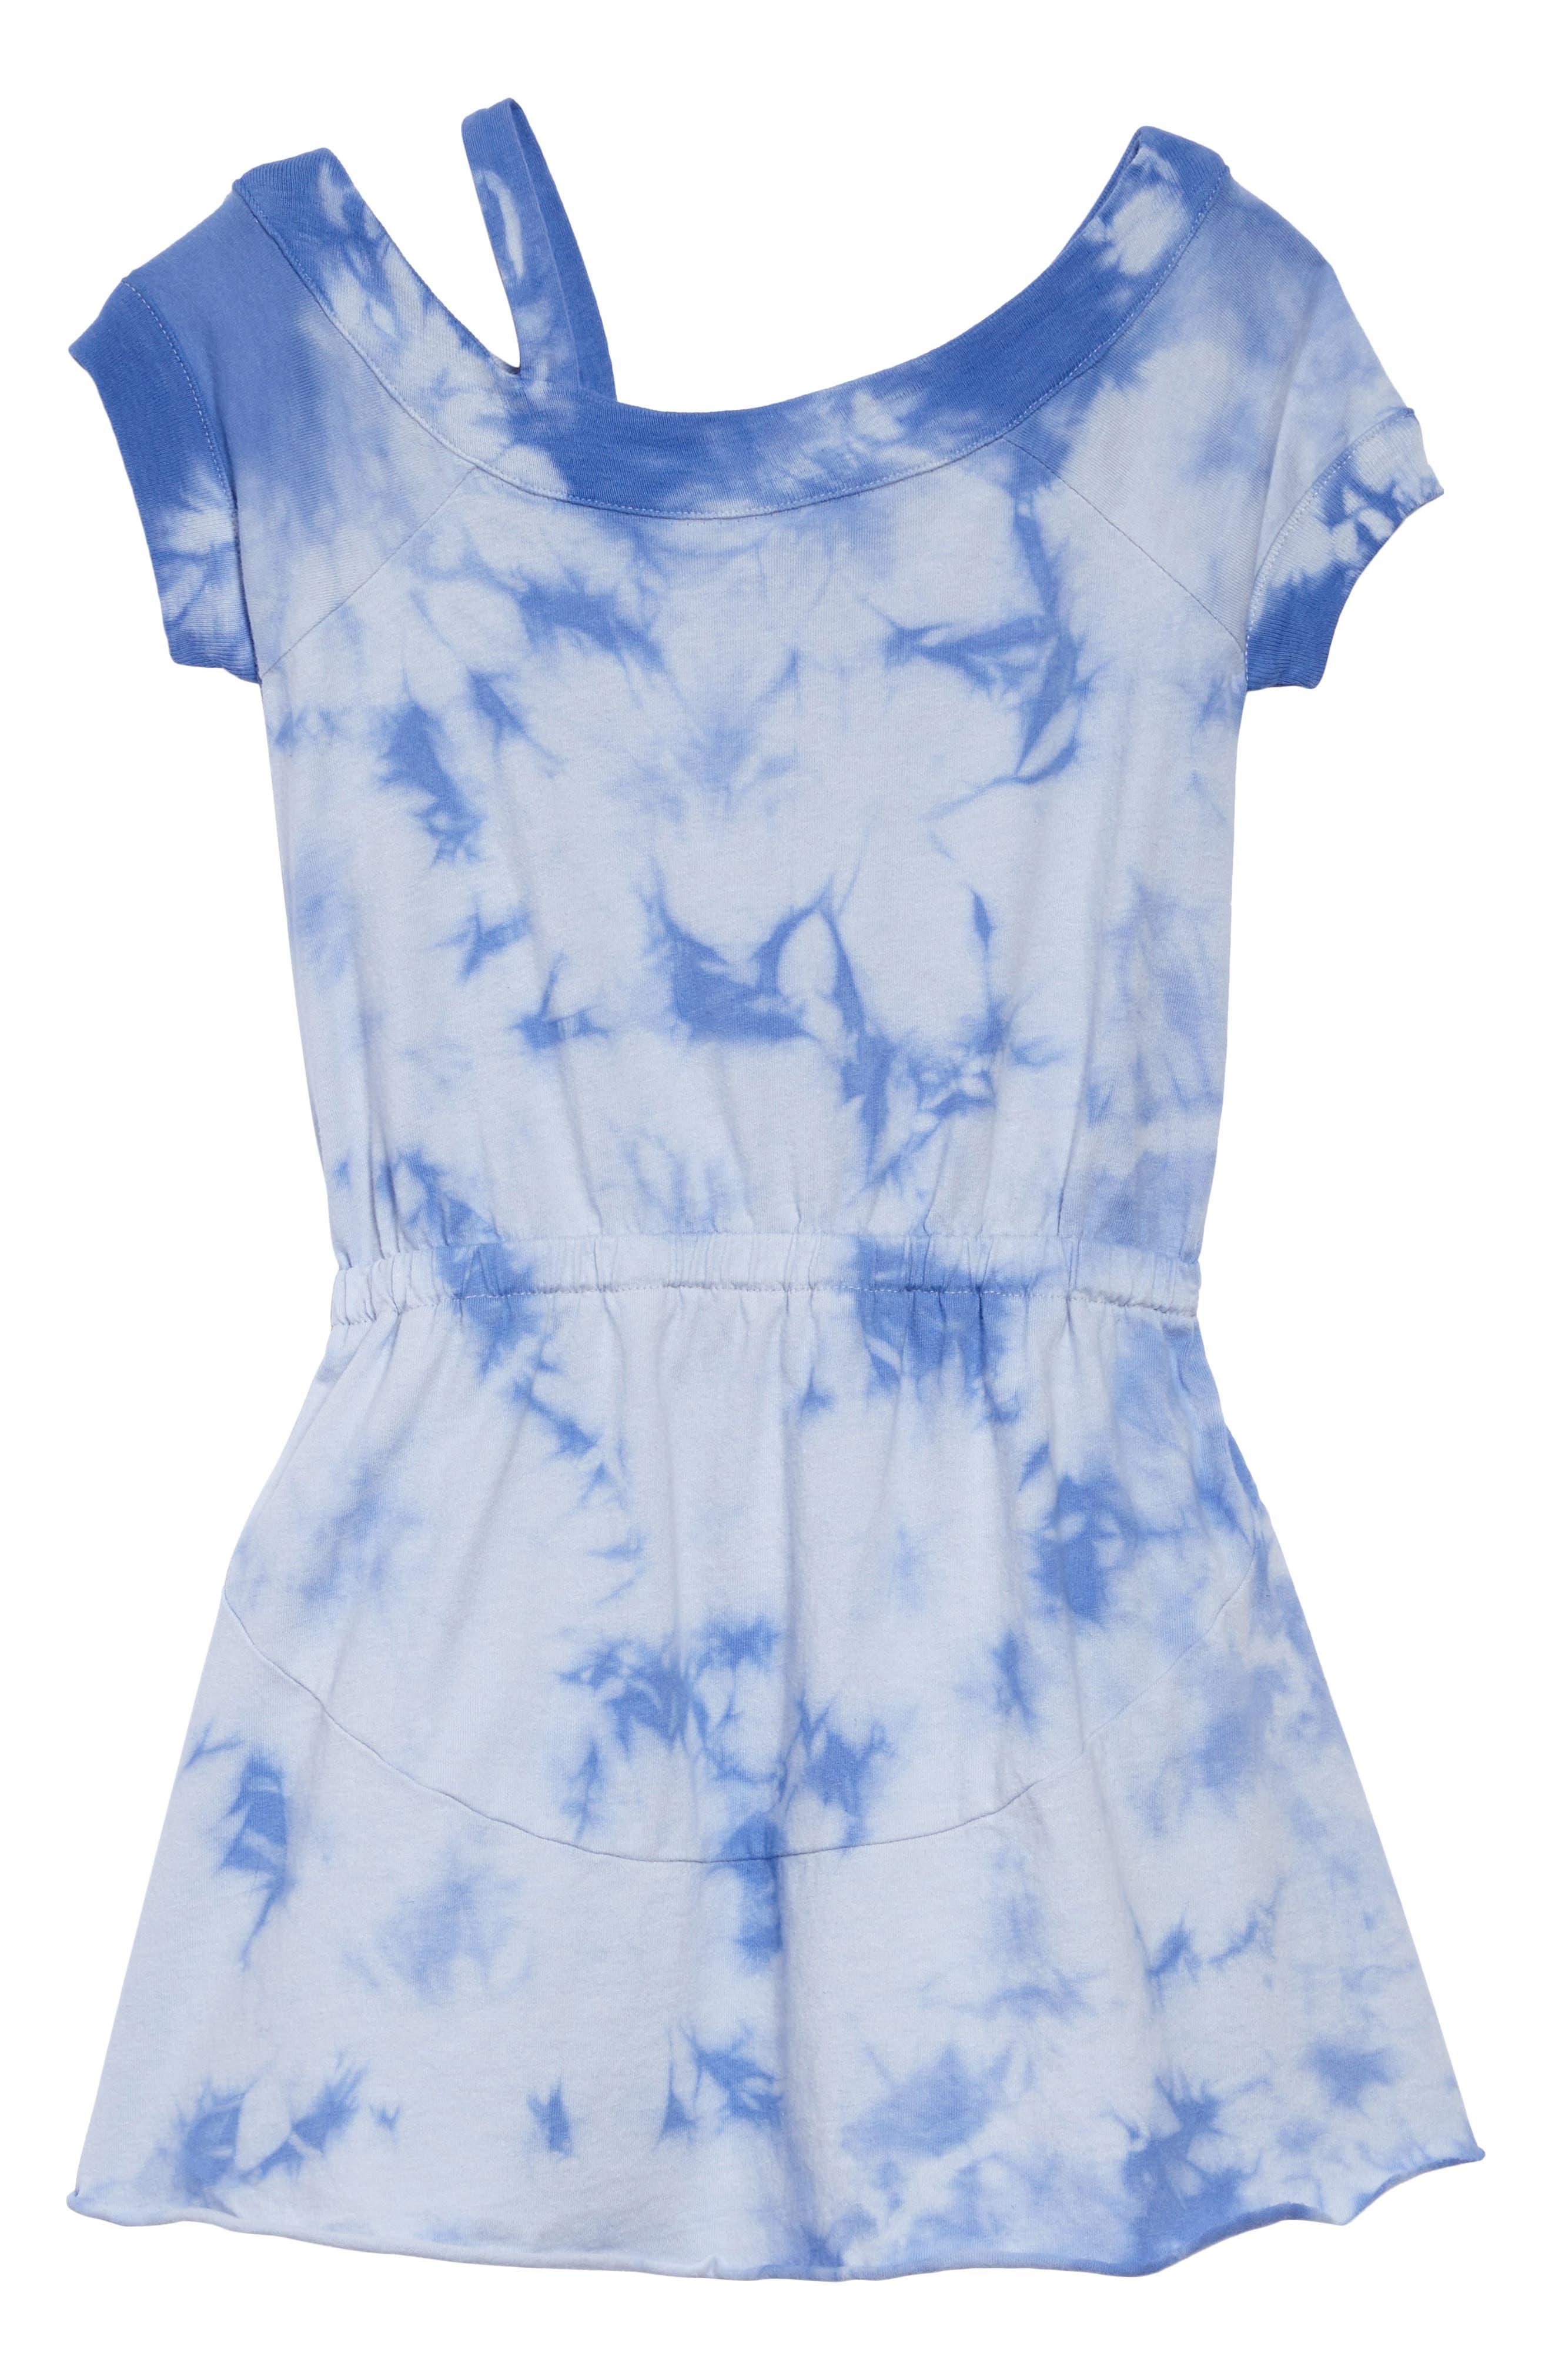 One-Shoulder Tie Dye Dress,                             Main thumbnail 1, color,                             Hydrangea